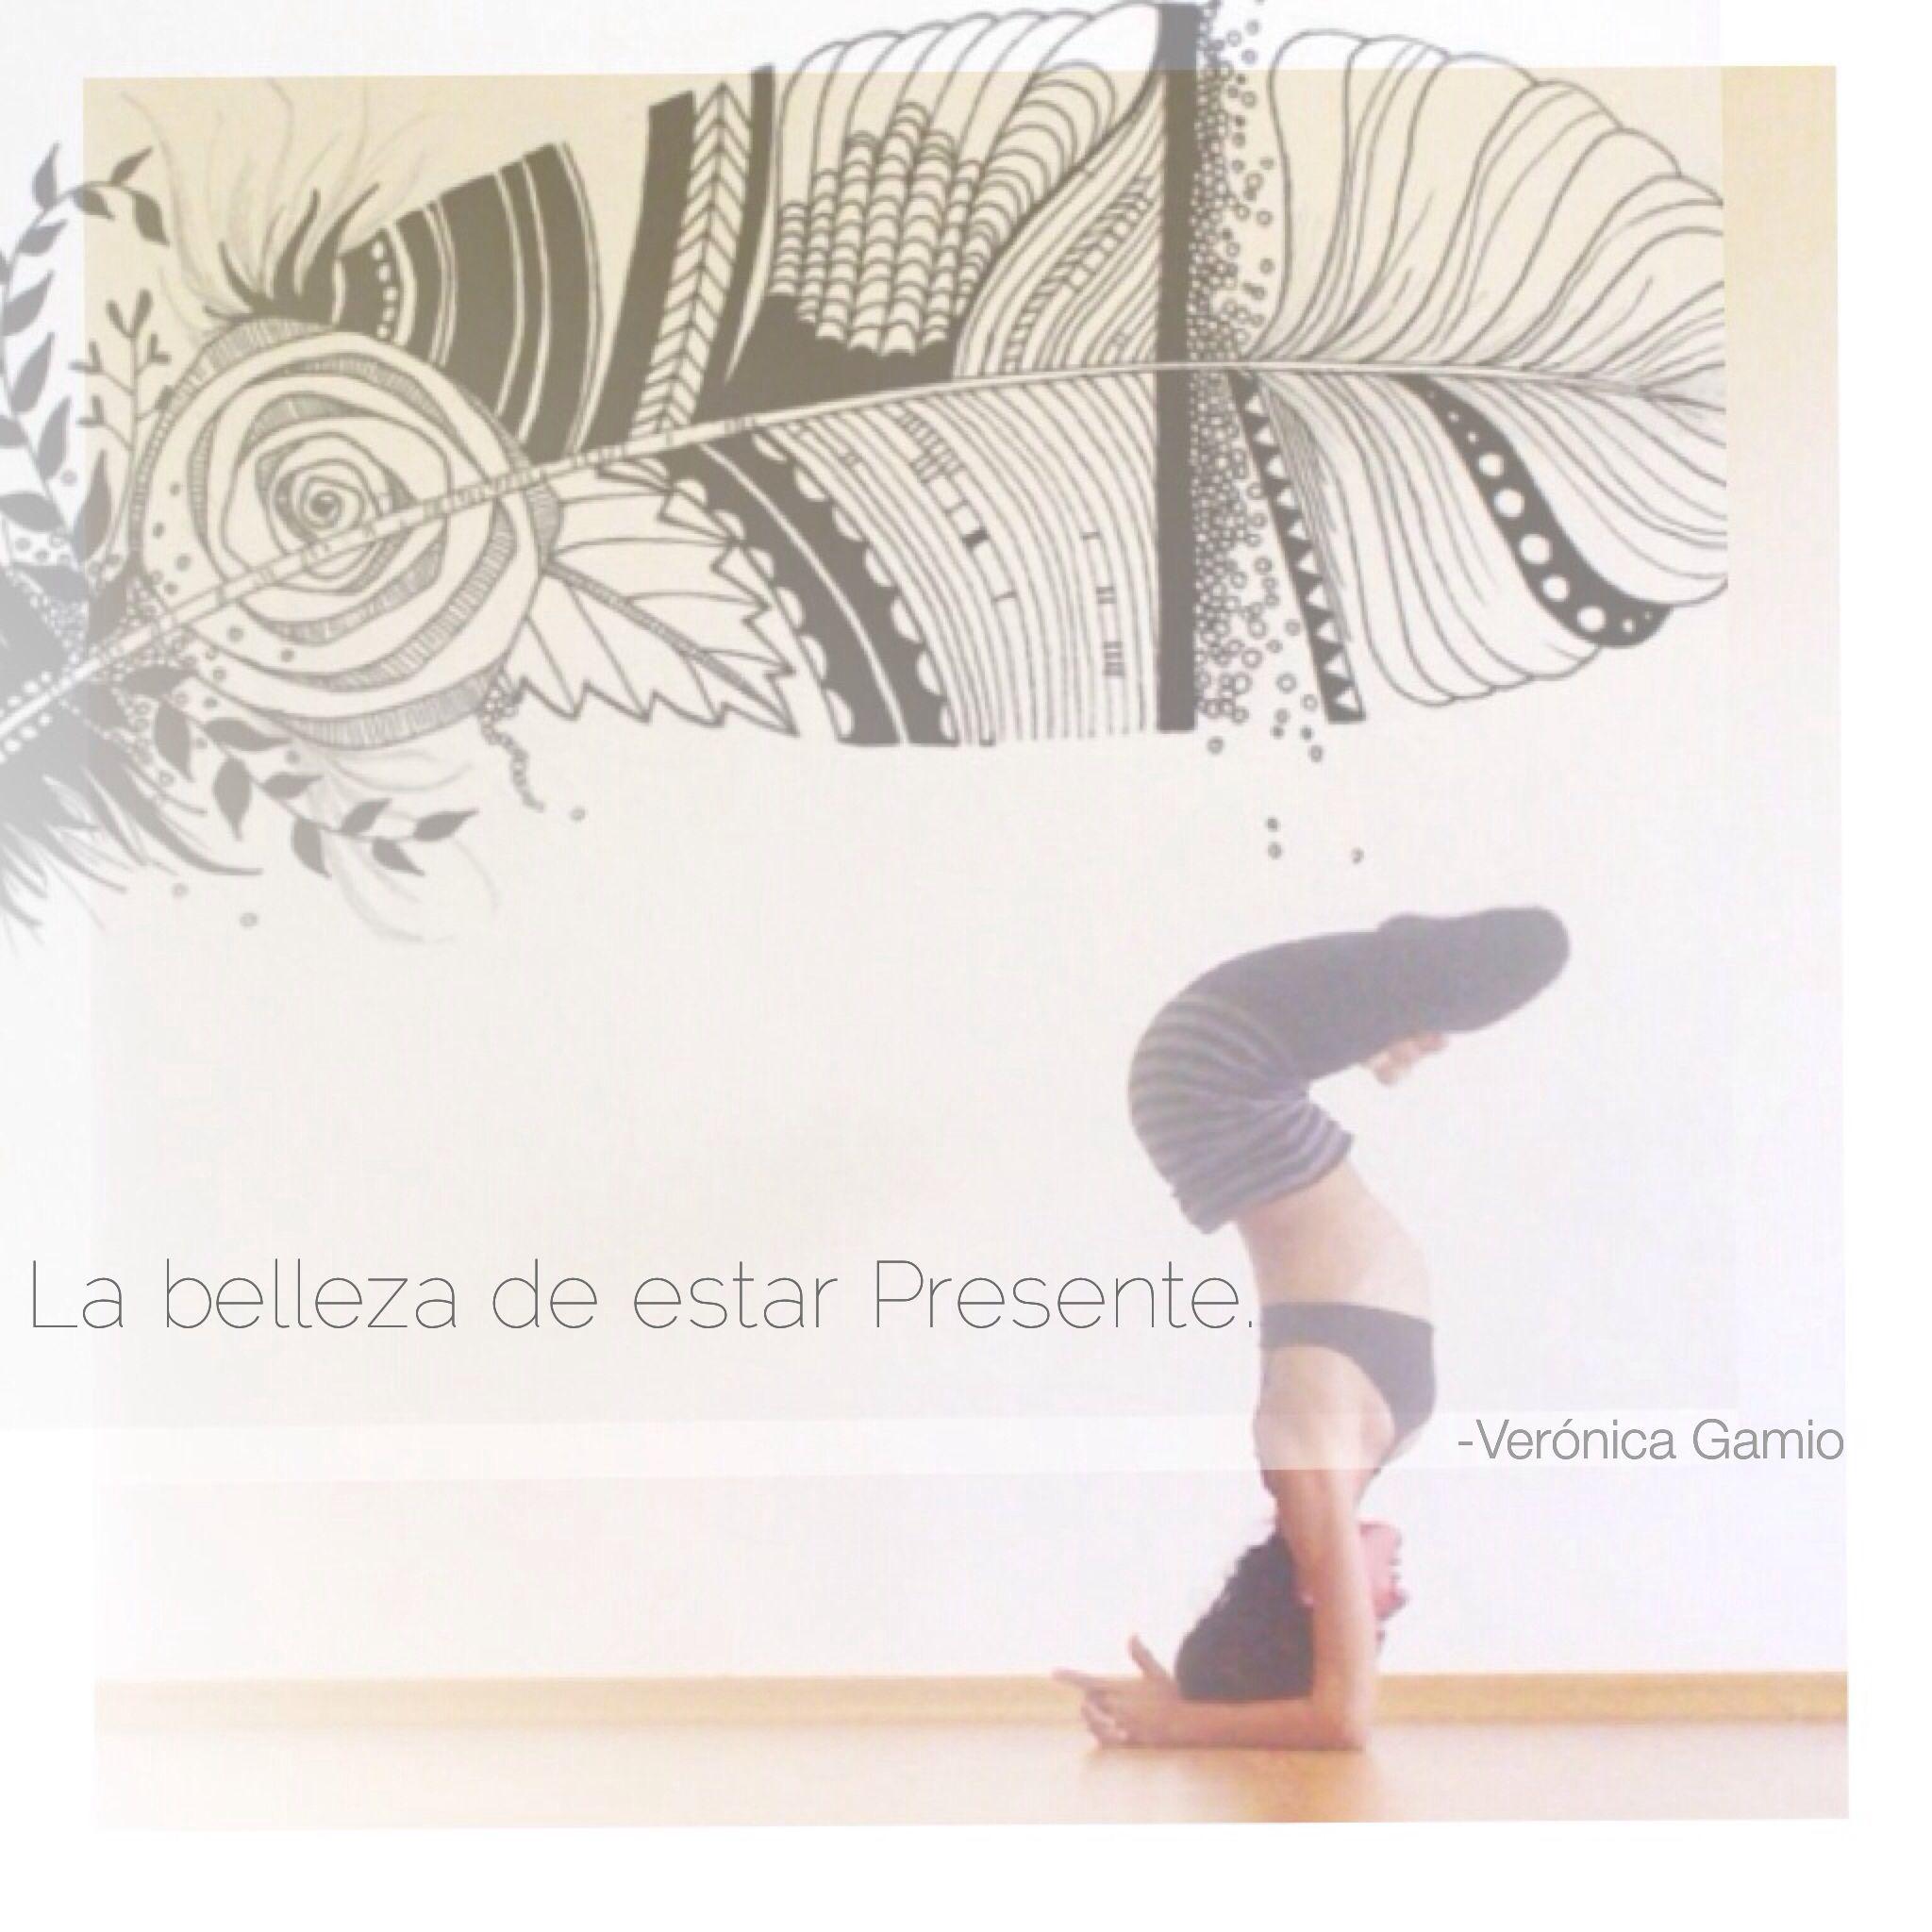 #yogafueradelmat #parainspirarte #quote#inspiration #yoga #selfandart